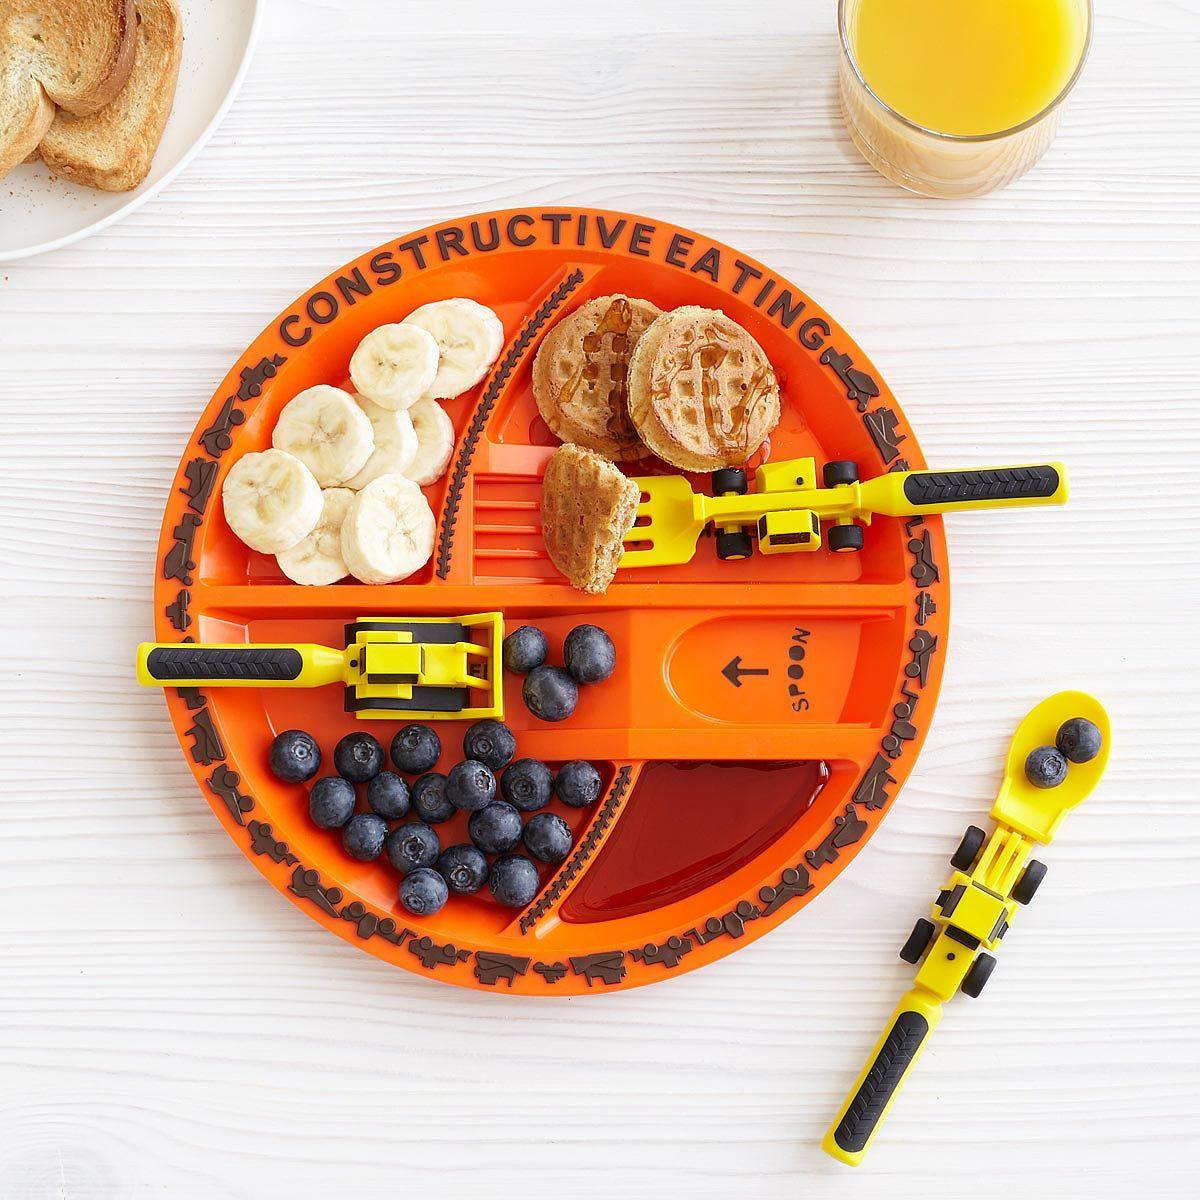 Construction Plate Utensils Kids Dinnerware Sets Kids Dinnerware Kids Dinnerware Set Childrens Dishes